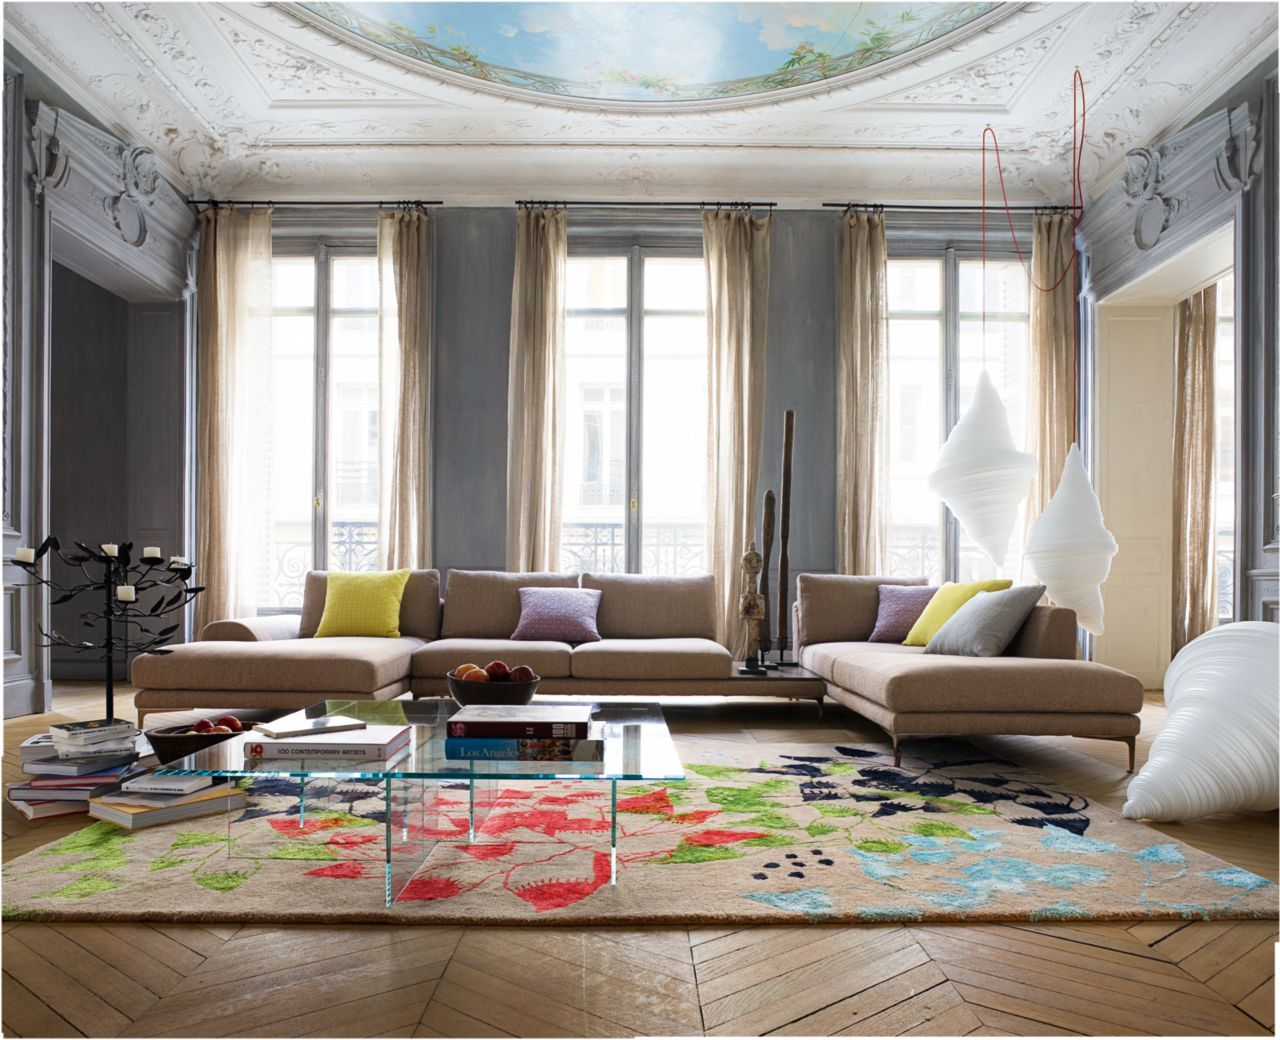 Pin di MG_italylover su Living room | Pinterest